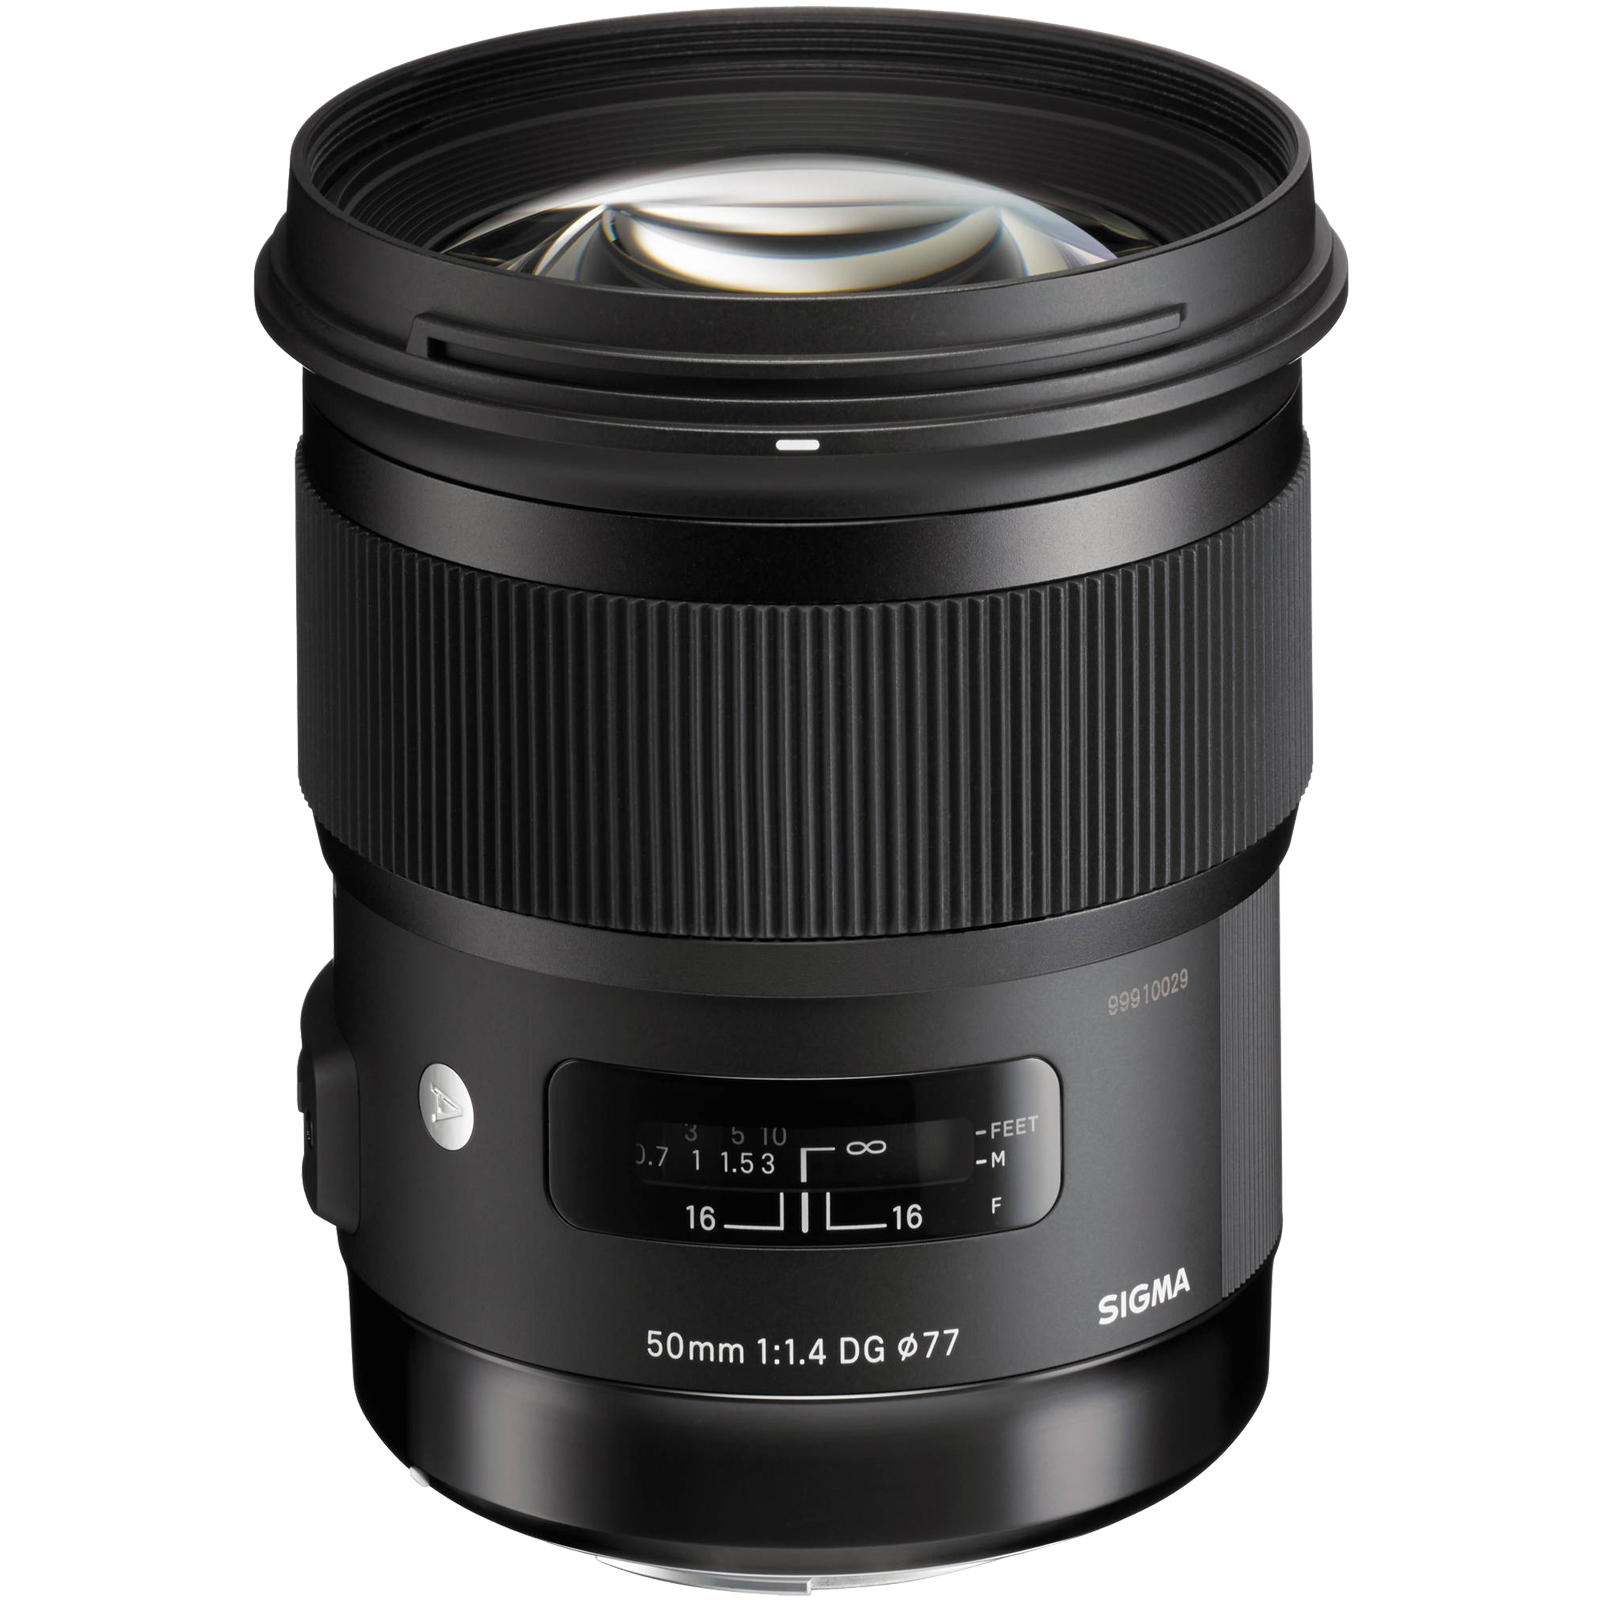 Sigma 50mm f/1.4 ART DG HSM Lens (for Sony Alpha E-Mount Cameras)